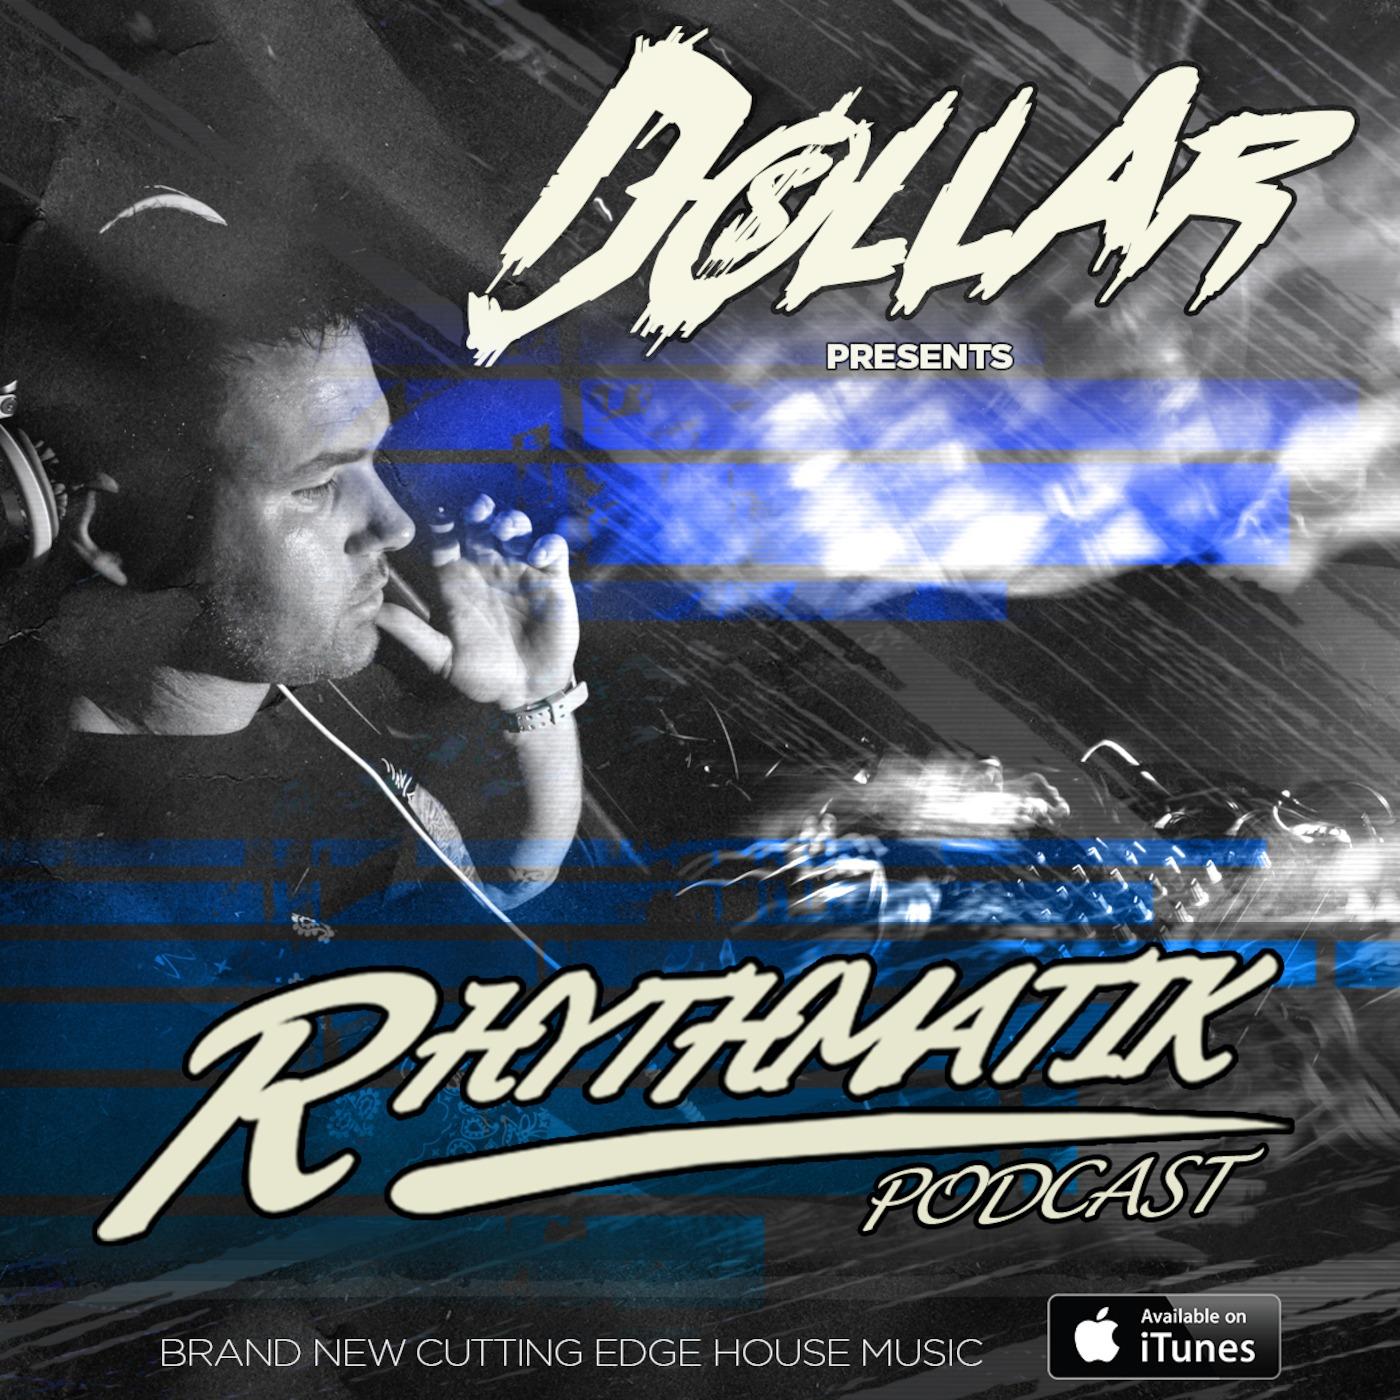 Dollar presents RHYTHMATIK